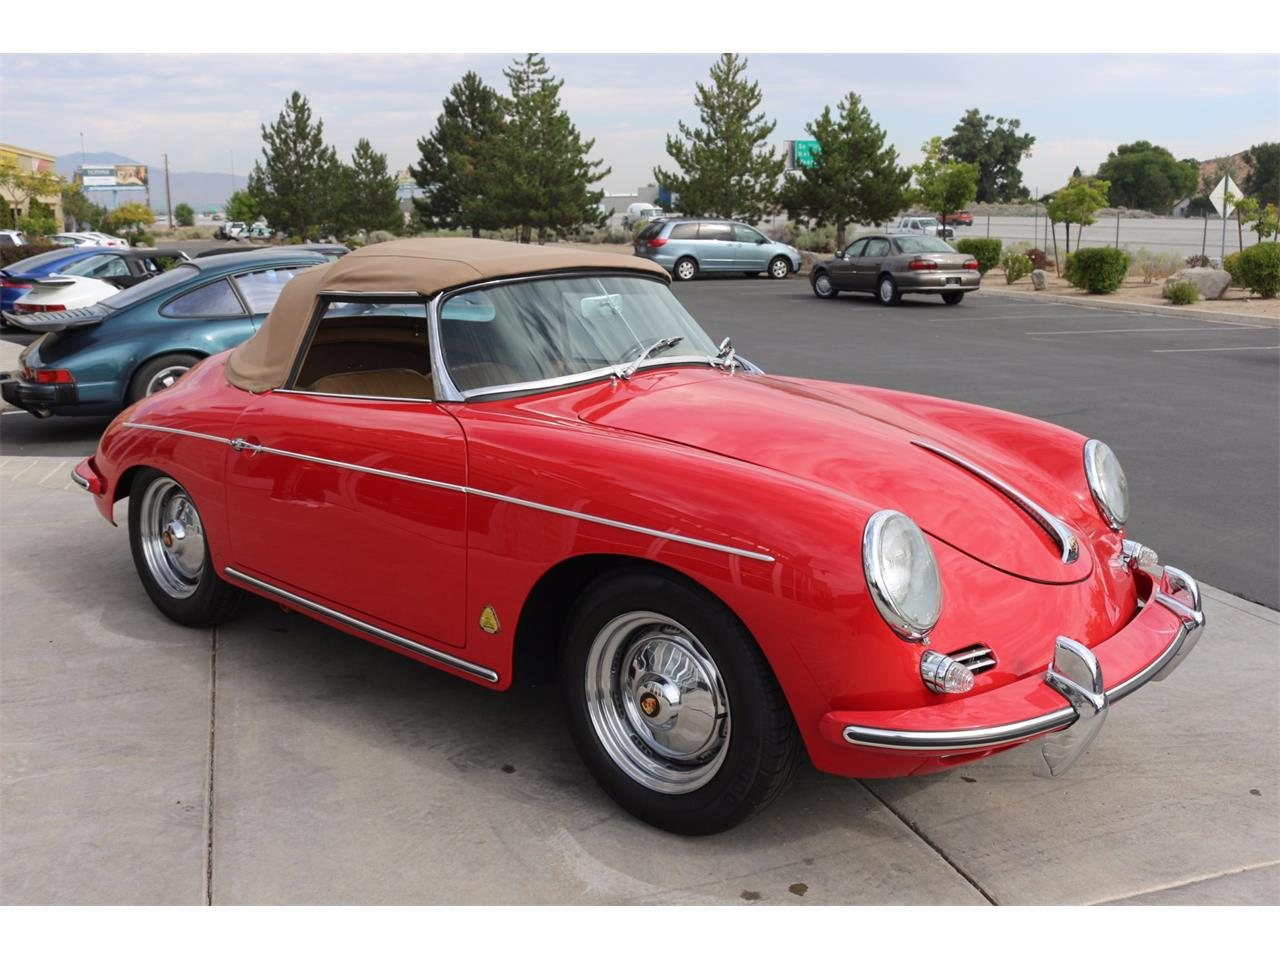 1960 Porsche 356 B Super 90 For Sale Classiccars Com Cc 1017014